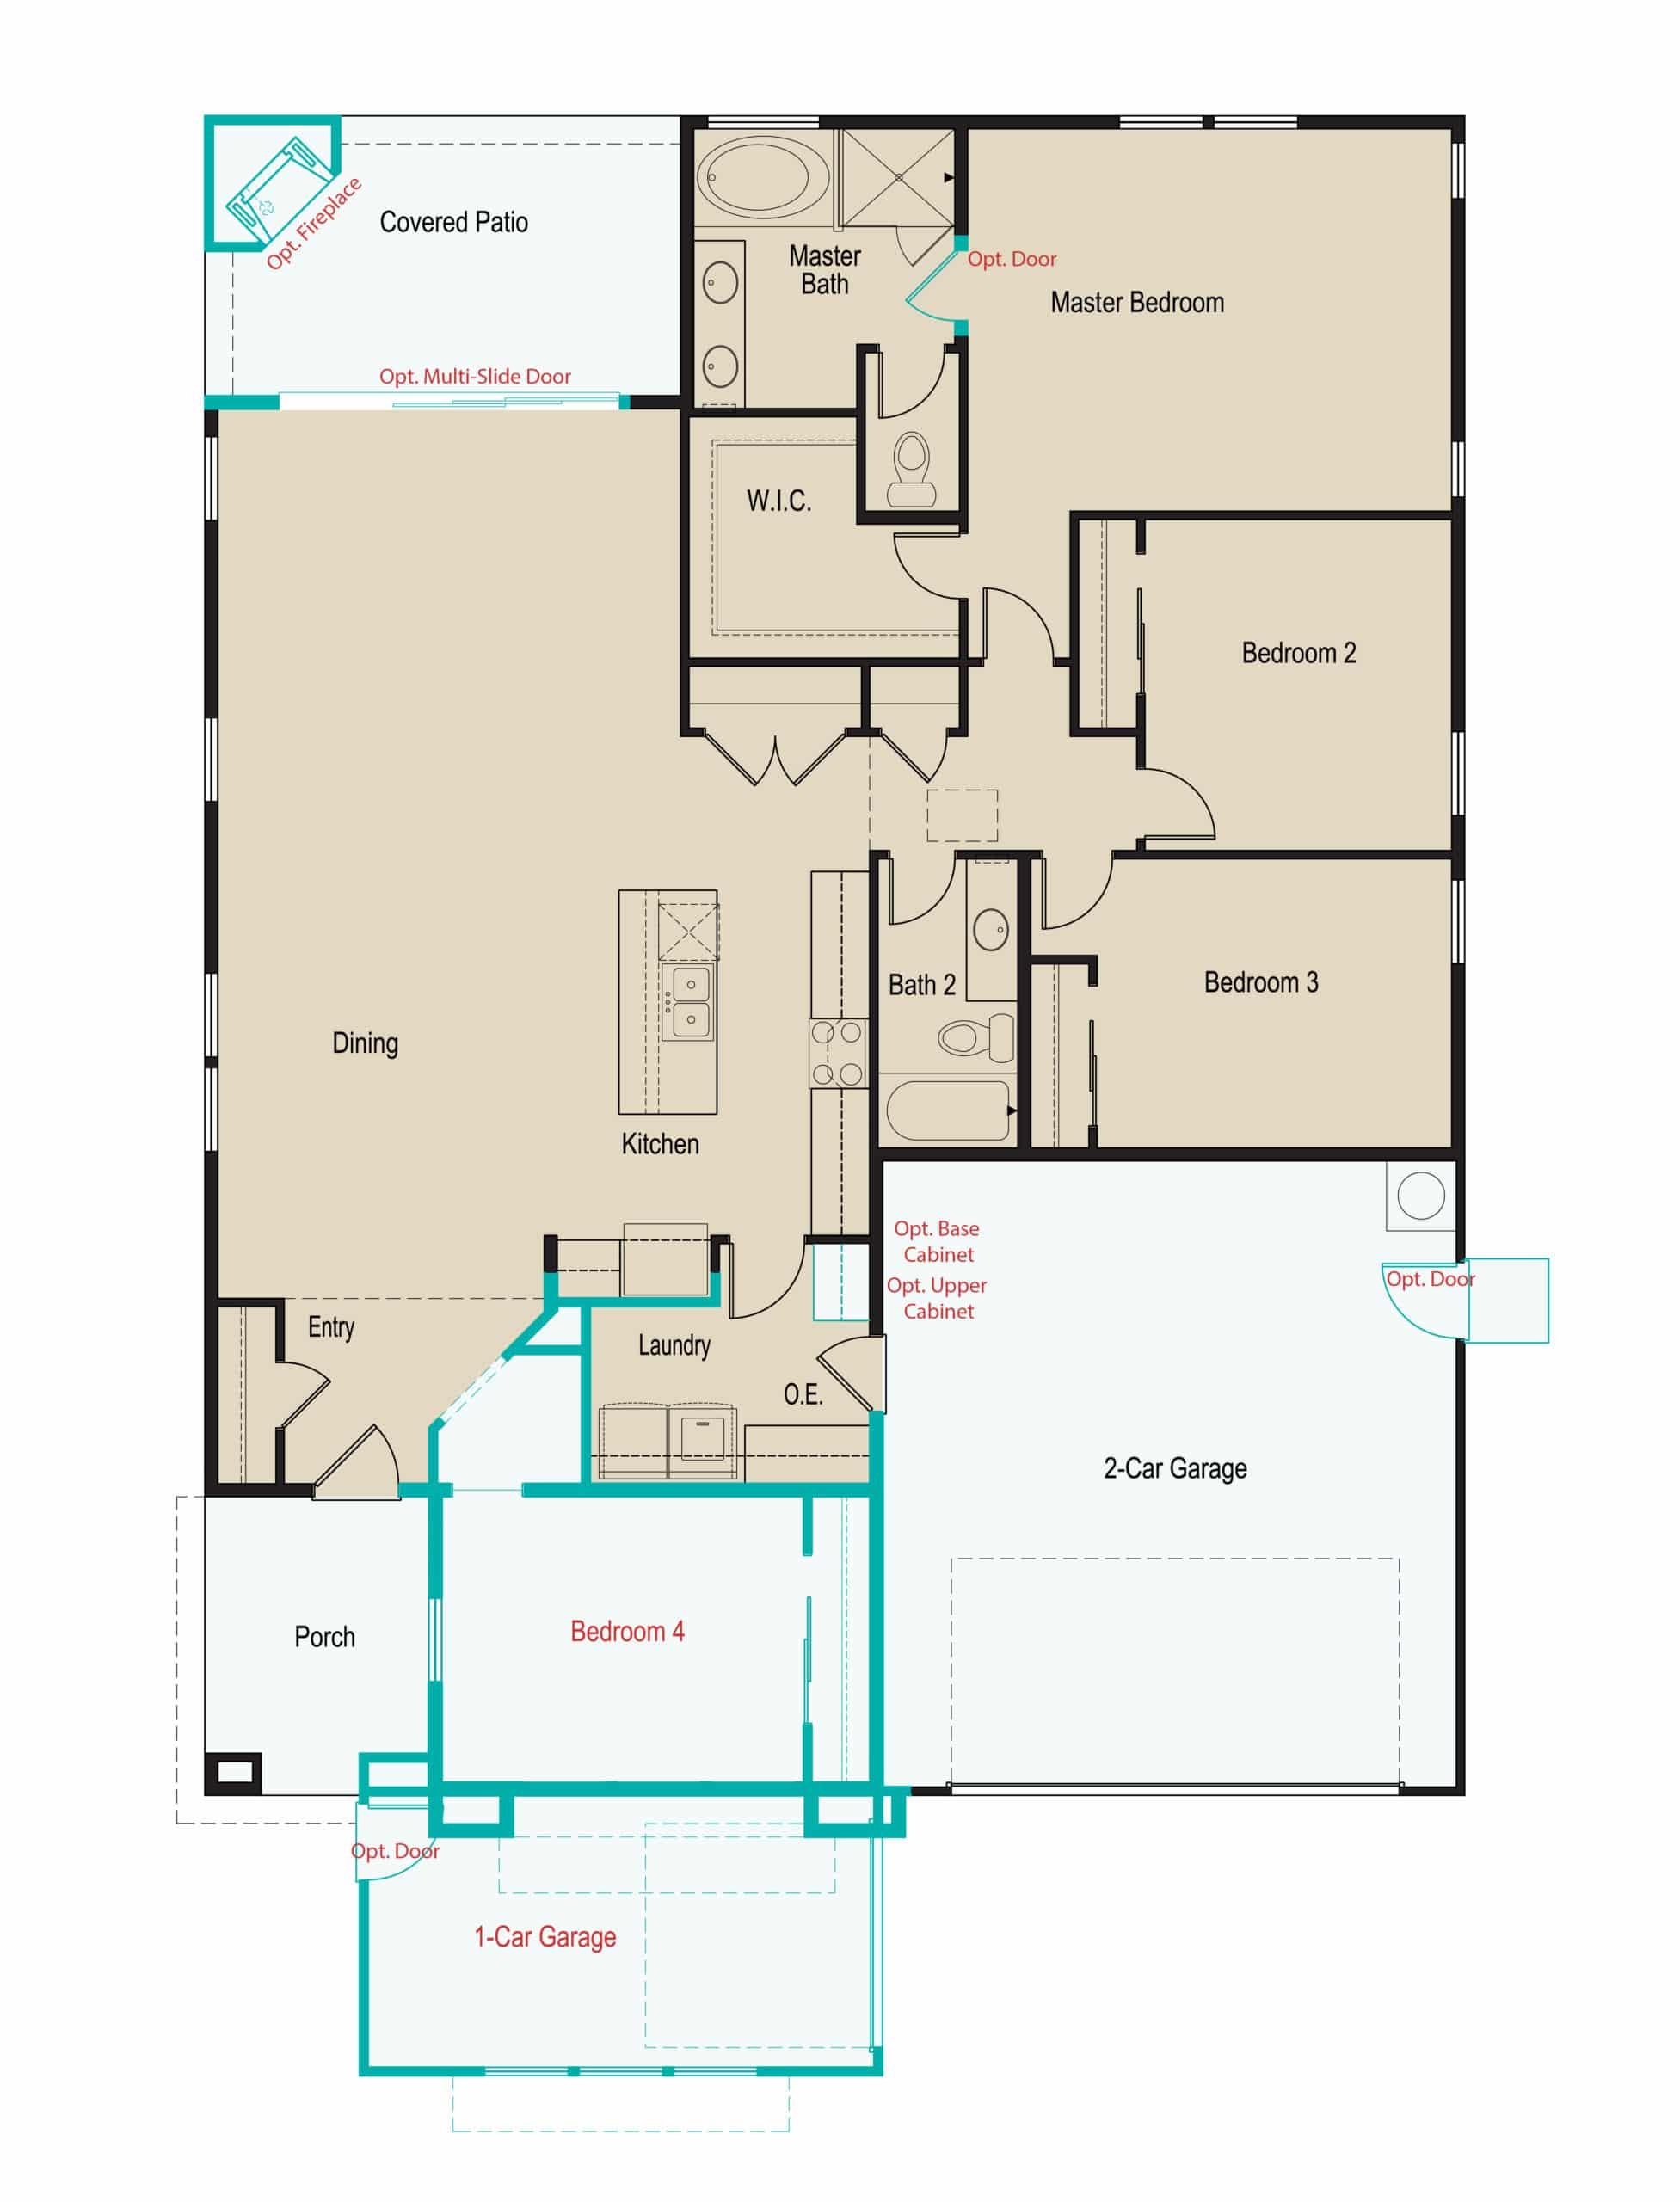 blackstone-plan-4-1973-options-floorplan-9-22